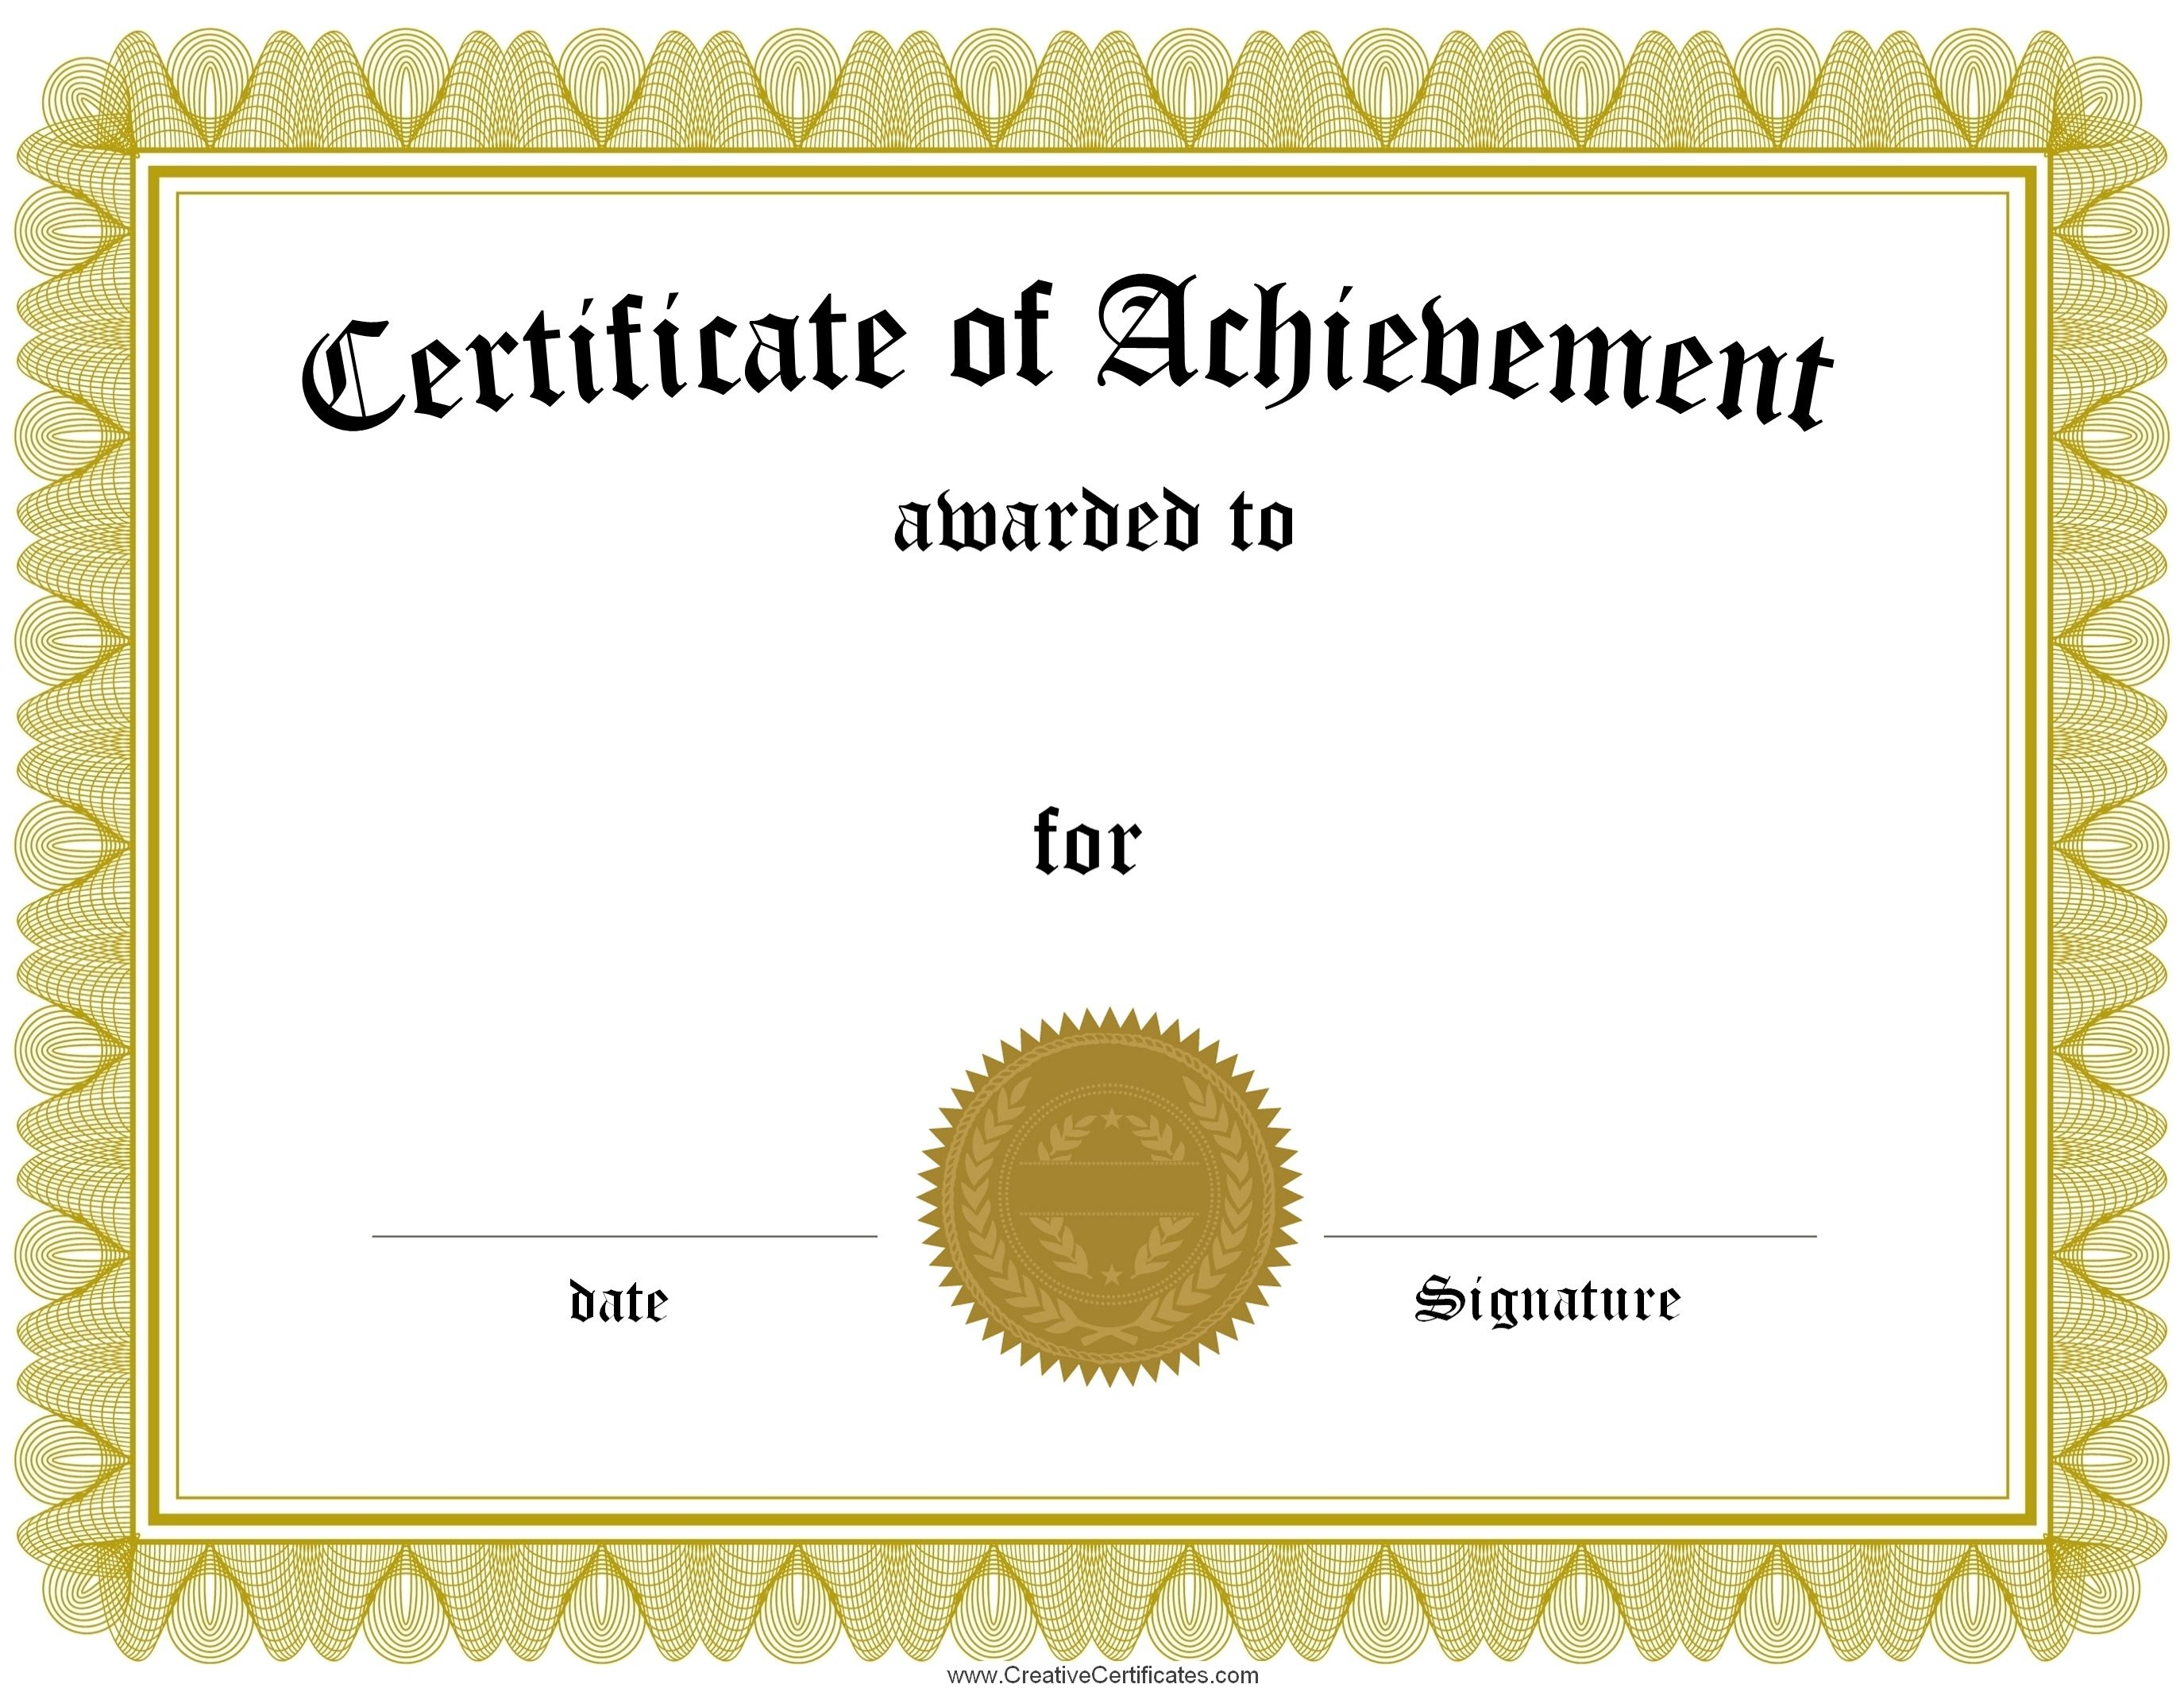 Paper Awards Certificates Free - Tutlin.psstech.co - Free Printable Softball Certificates